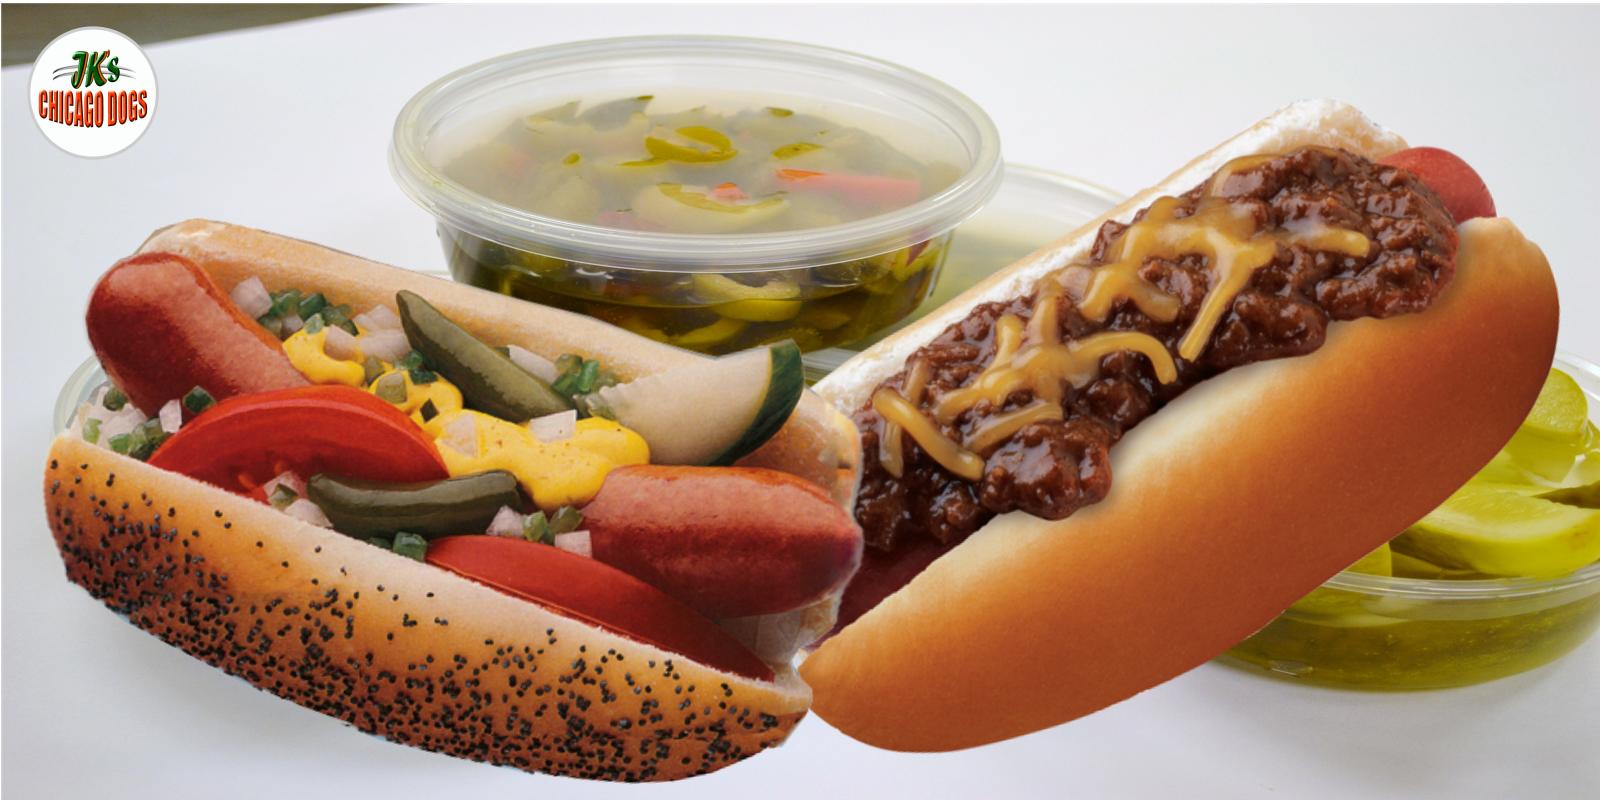 Hot dogs in San Antonio